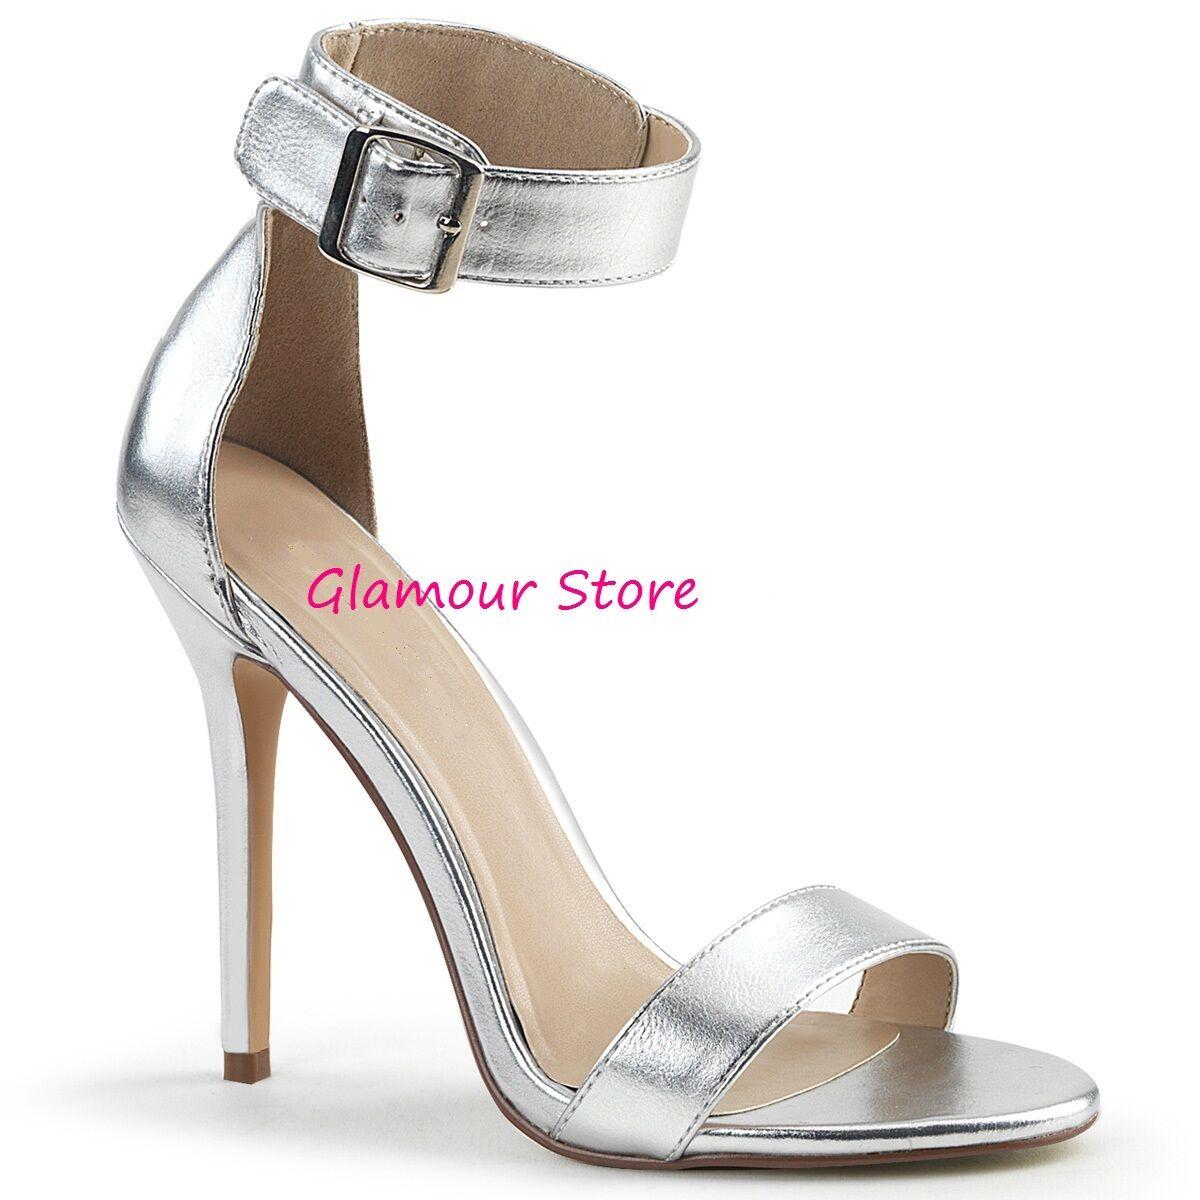 Sexy SANDALI tacco 13 ARGENTO dal 35 al 46 ARGENTO 13 cinturino scarpe GLAMOUR fashion 6b3ede